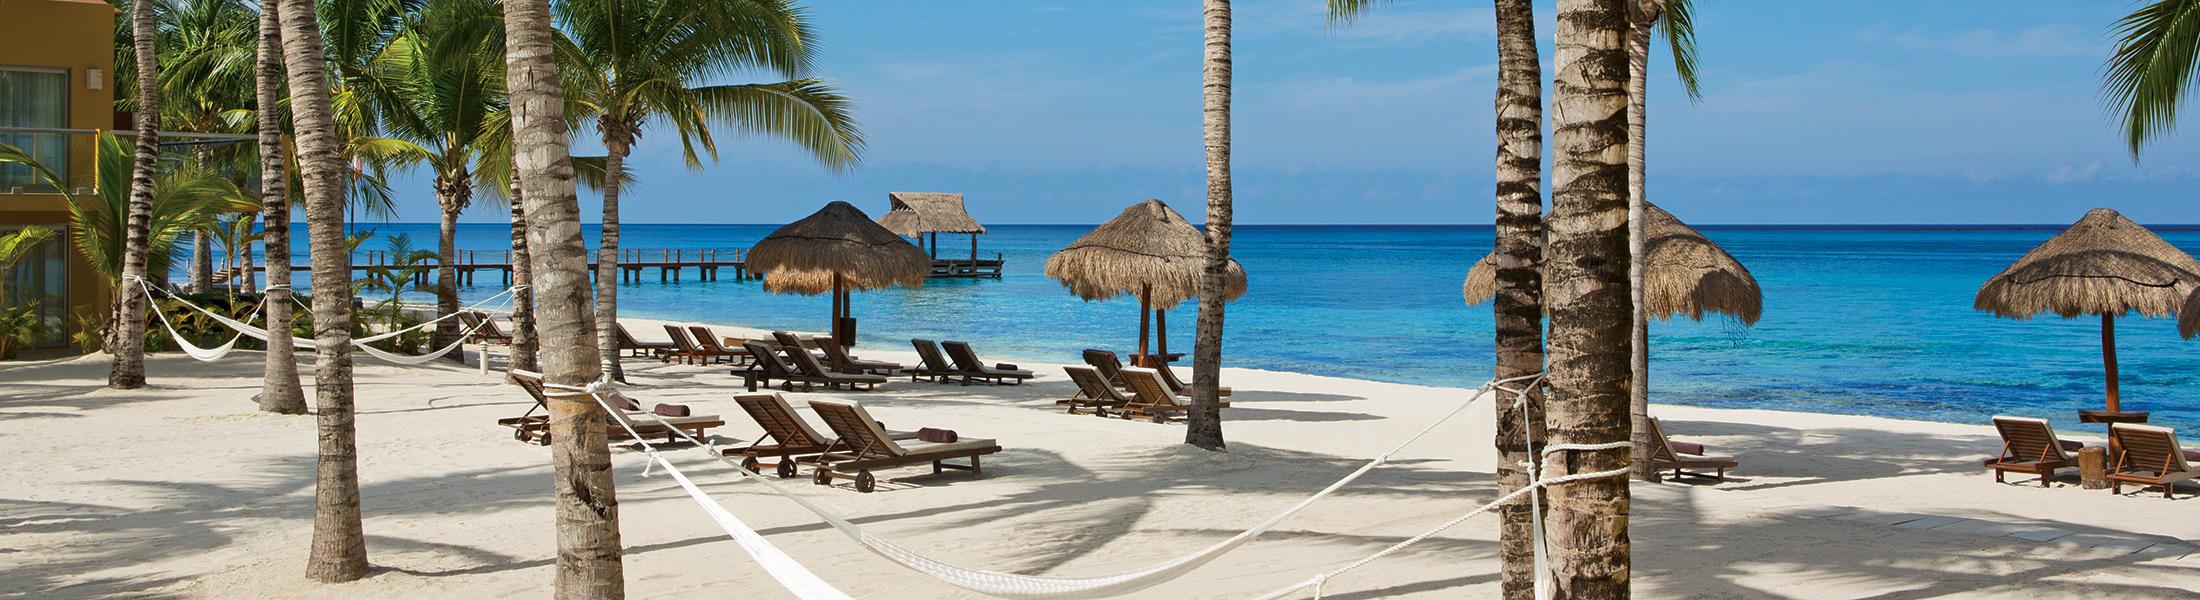 Hammocks & sun loungers between palm trees on the beach at Secrets Aura Cozumel